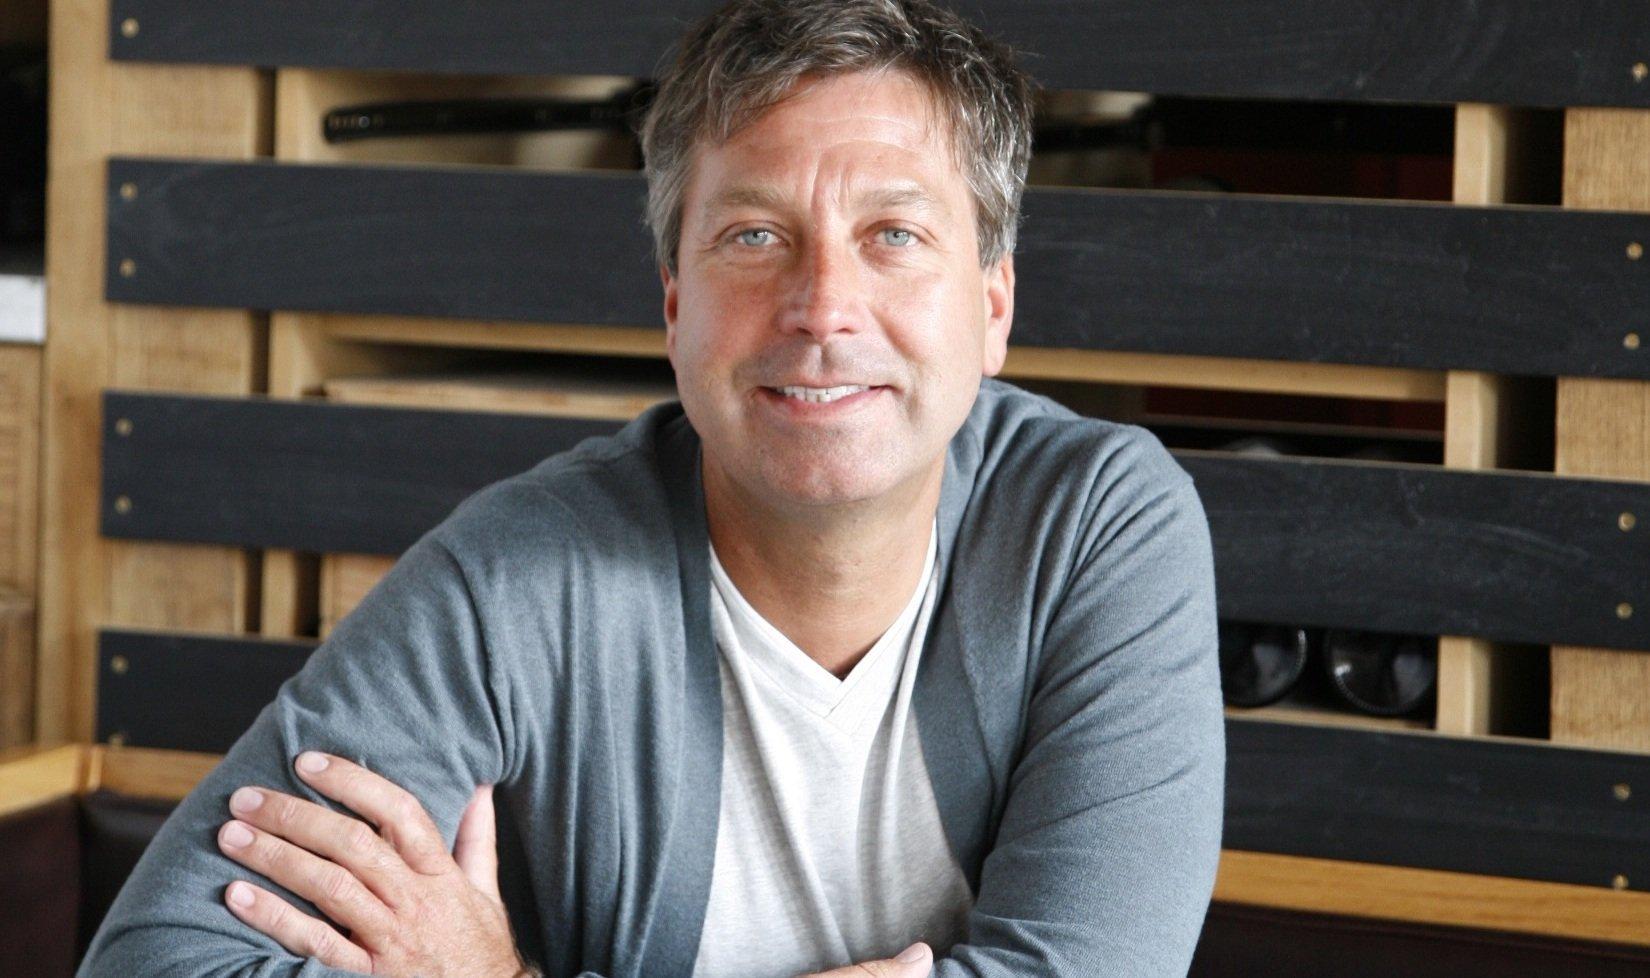 TV Chef John Torode To Headline Bishop Auckland Food Festival